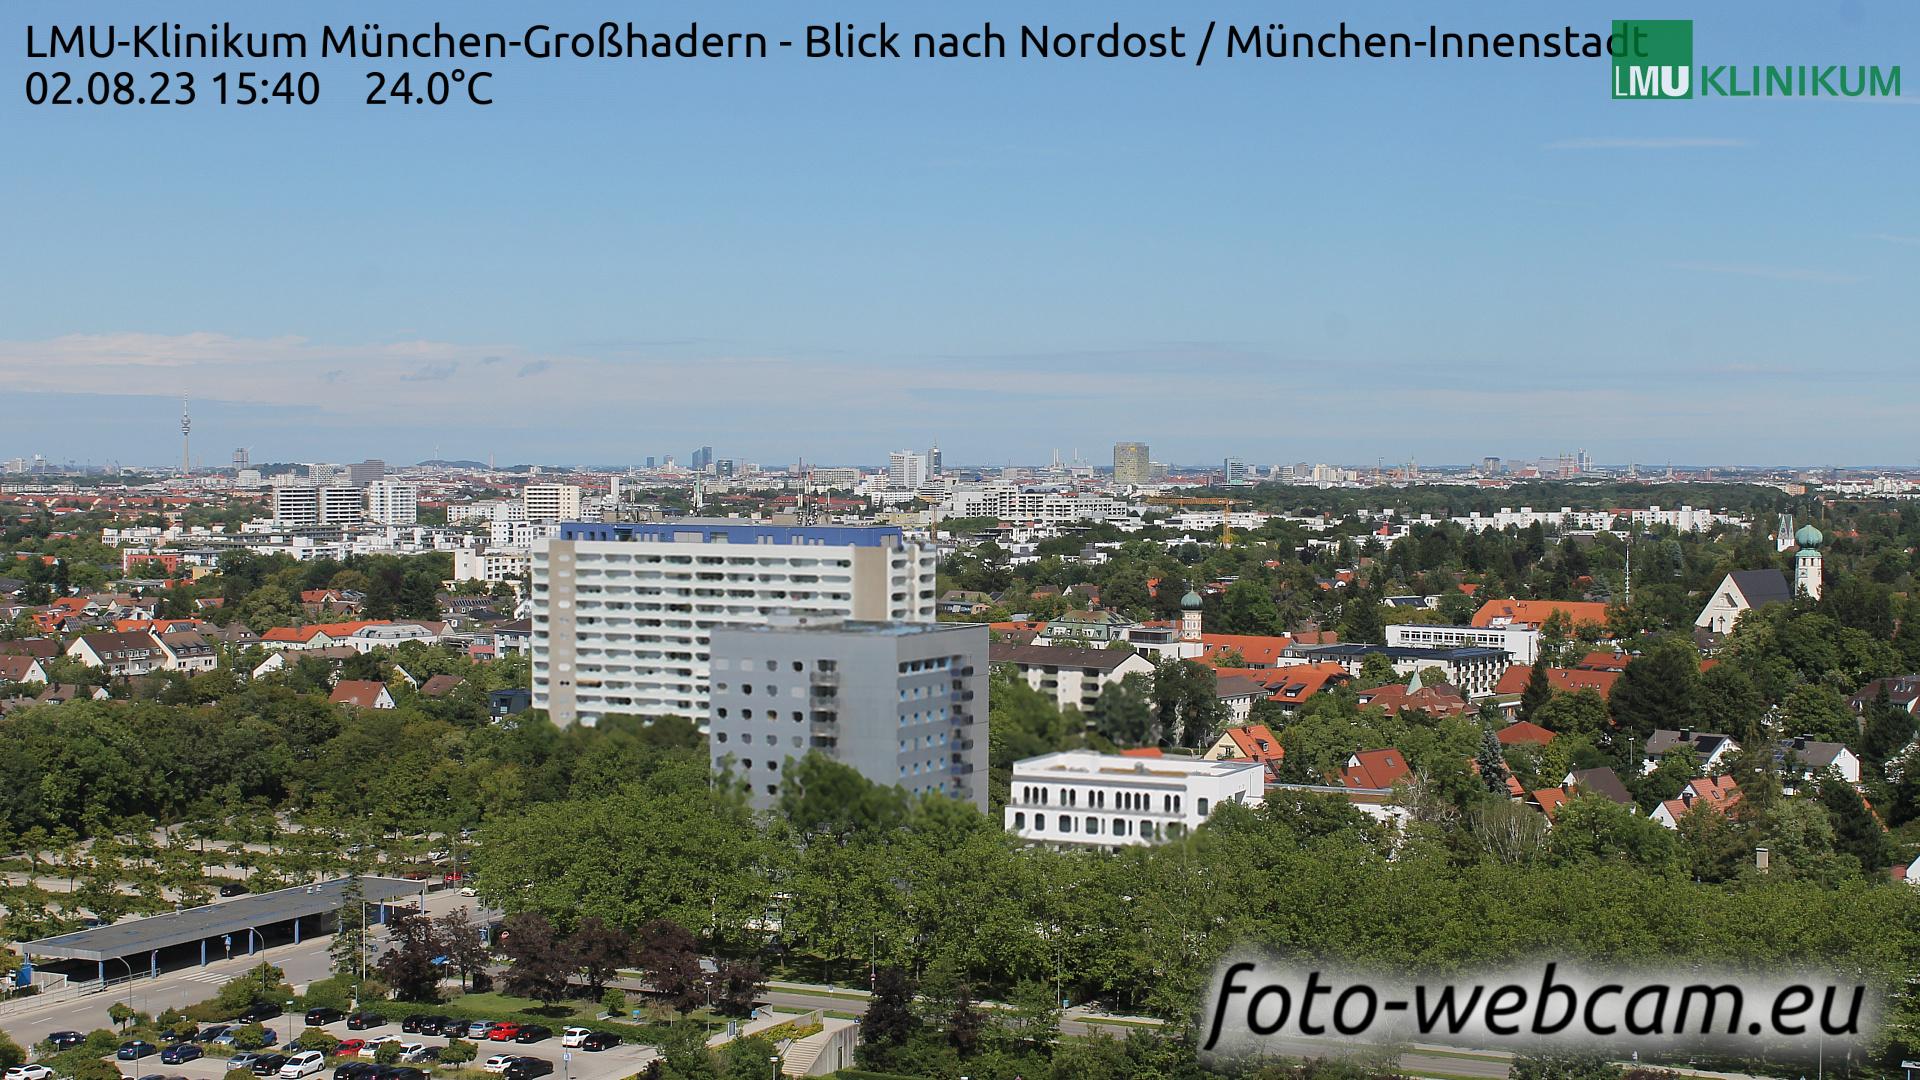 Munich Mon. 15:47